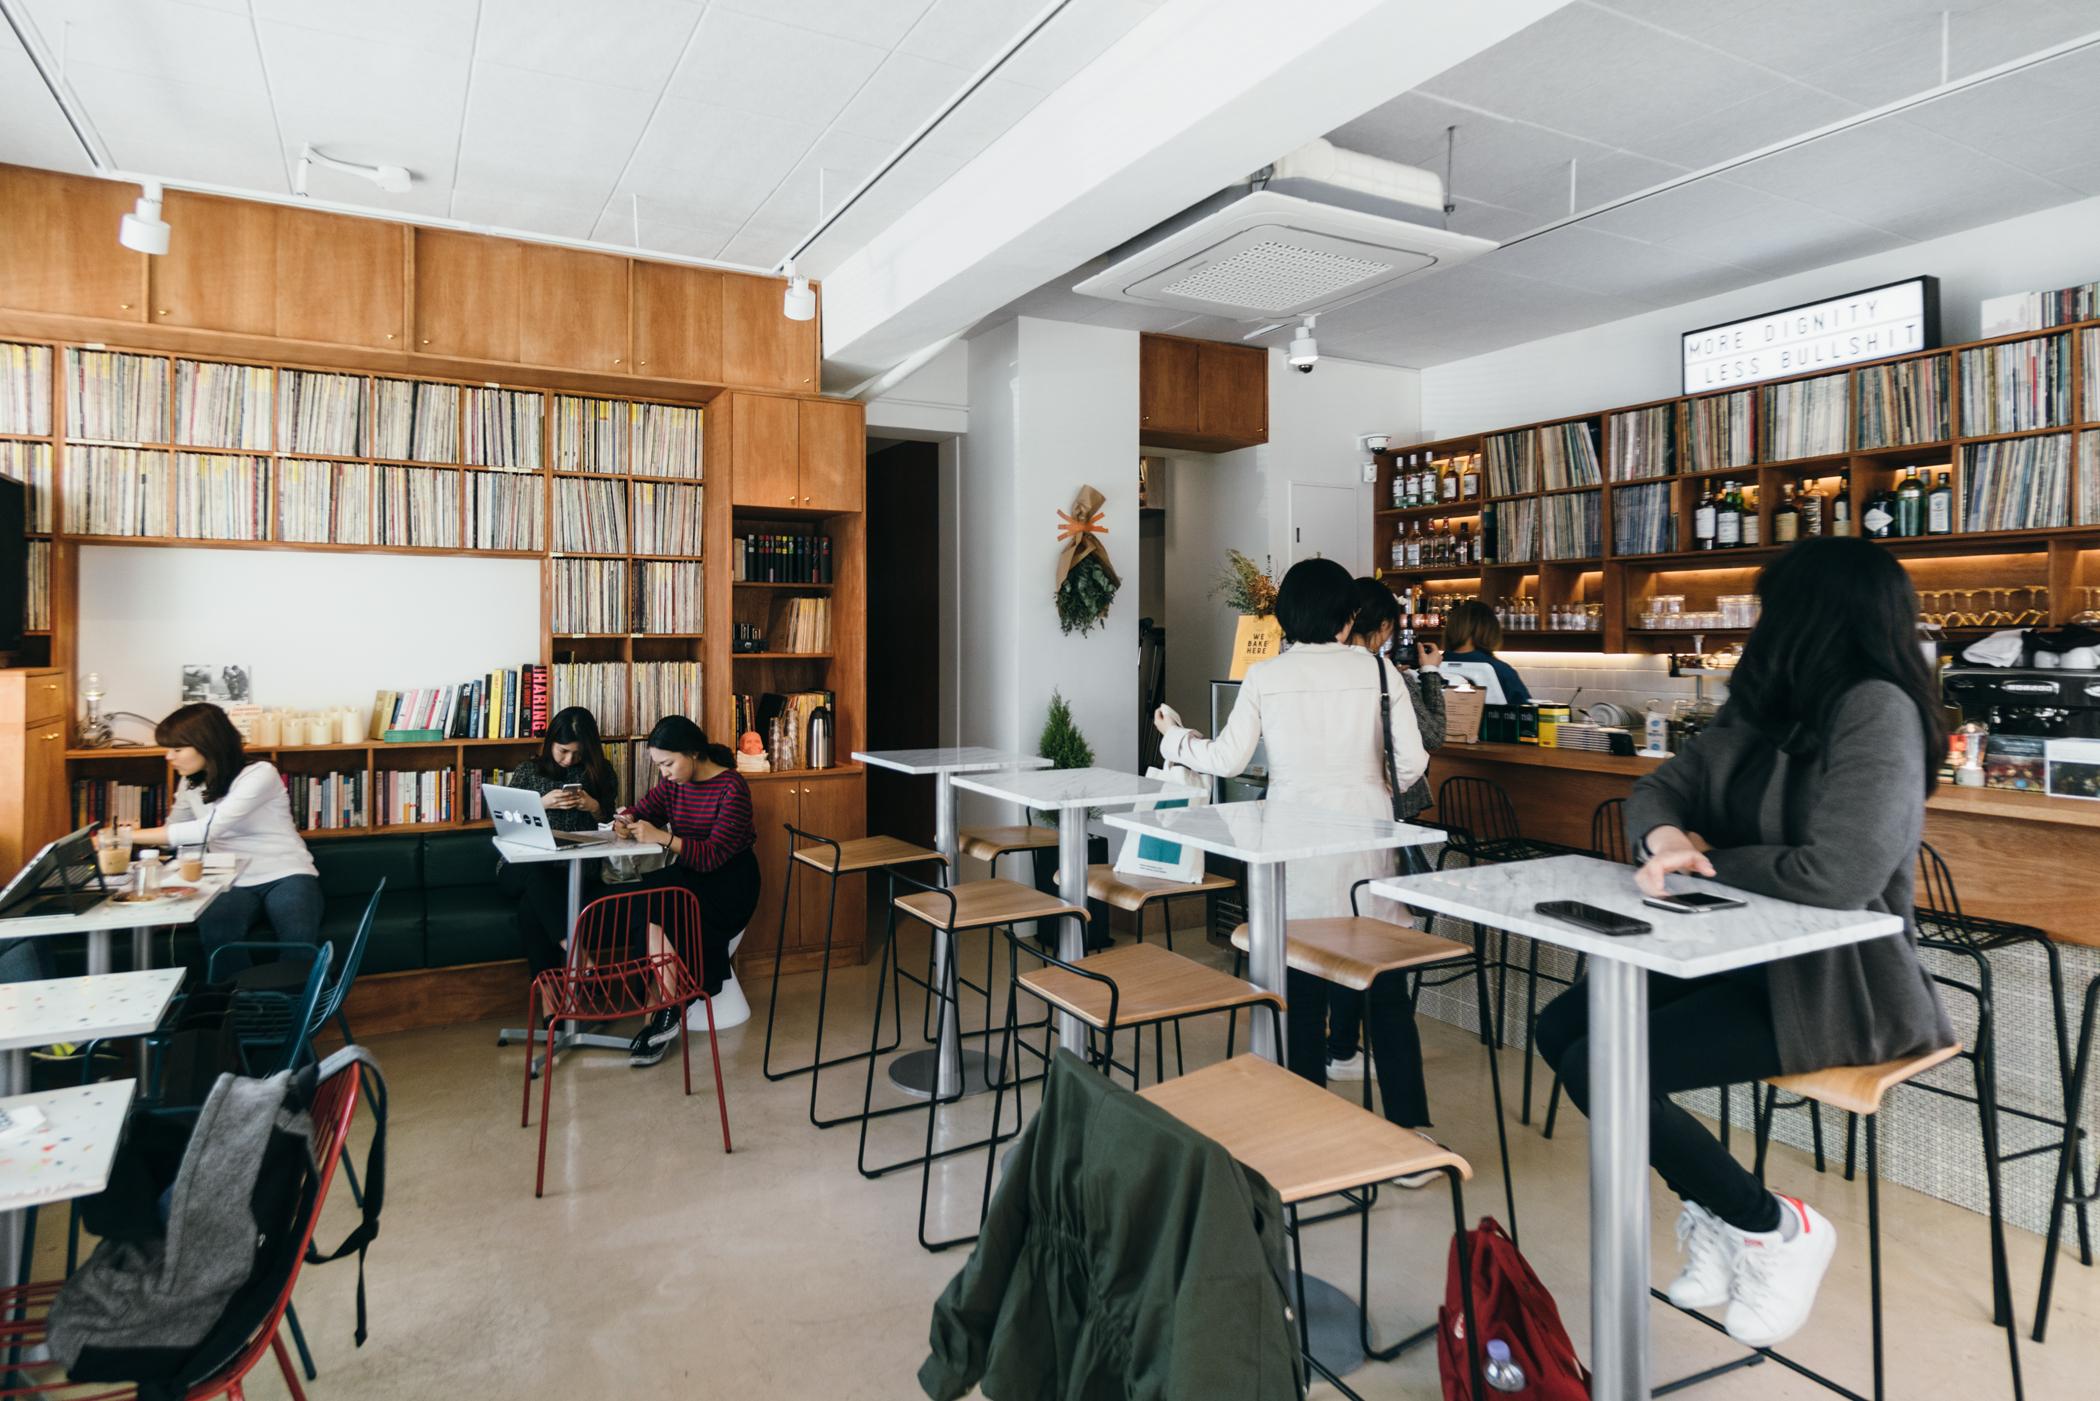 Greysuitcase Seoul Restaurant Series: Woolf Social Club (울프소셜클럽), Hannam-dong (한남동), Seoul, South Korea.